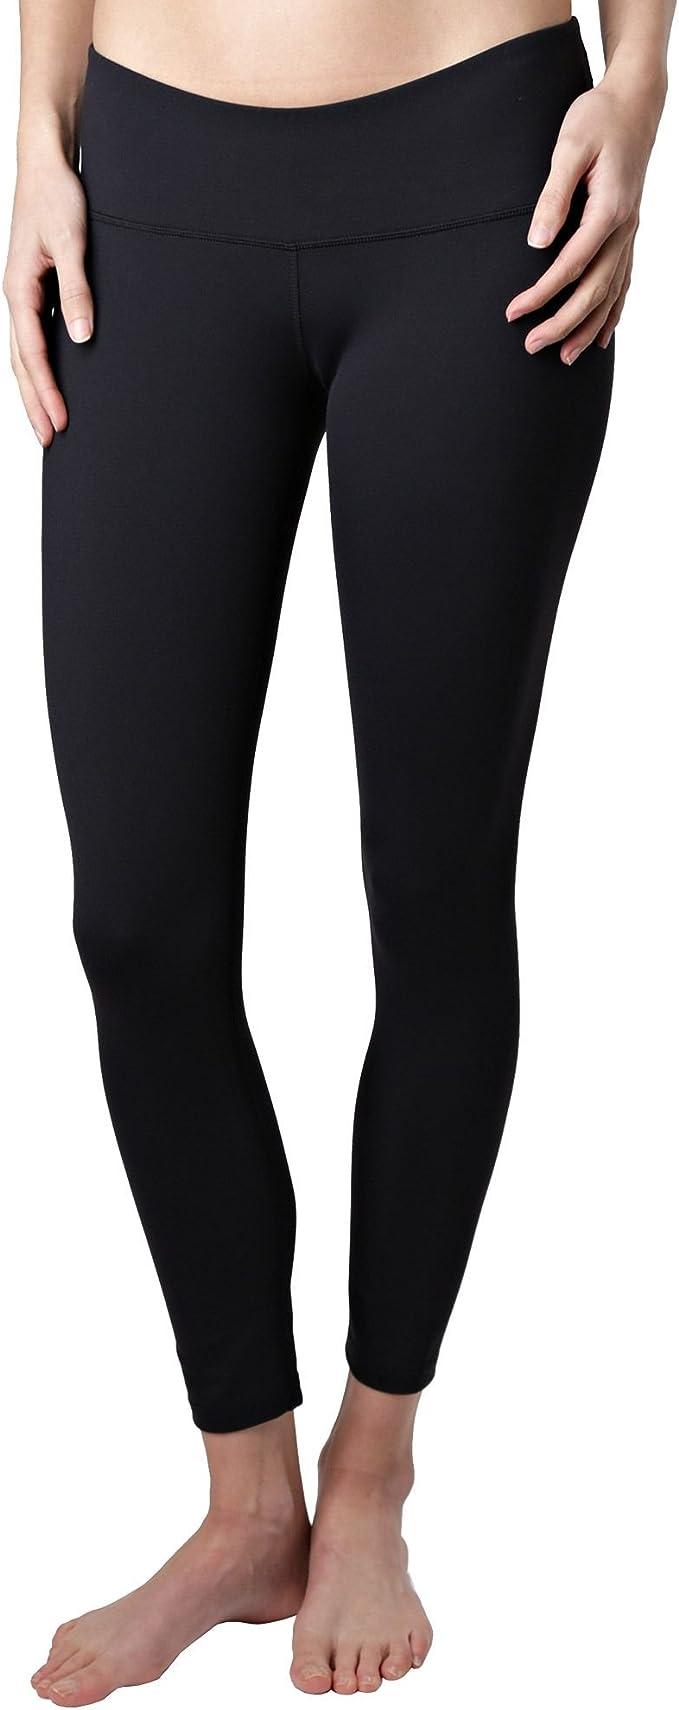 Comfort Skin TACTEL Leggins Sport Yoga Training Fitness Funktionsunterwäsche M